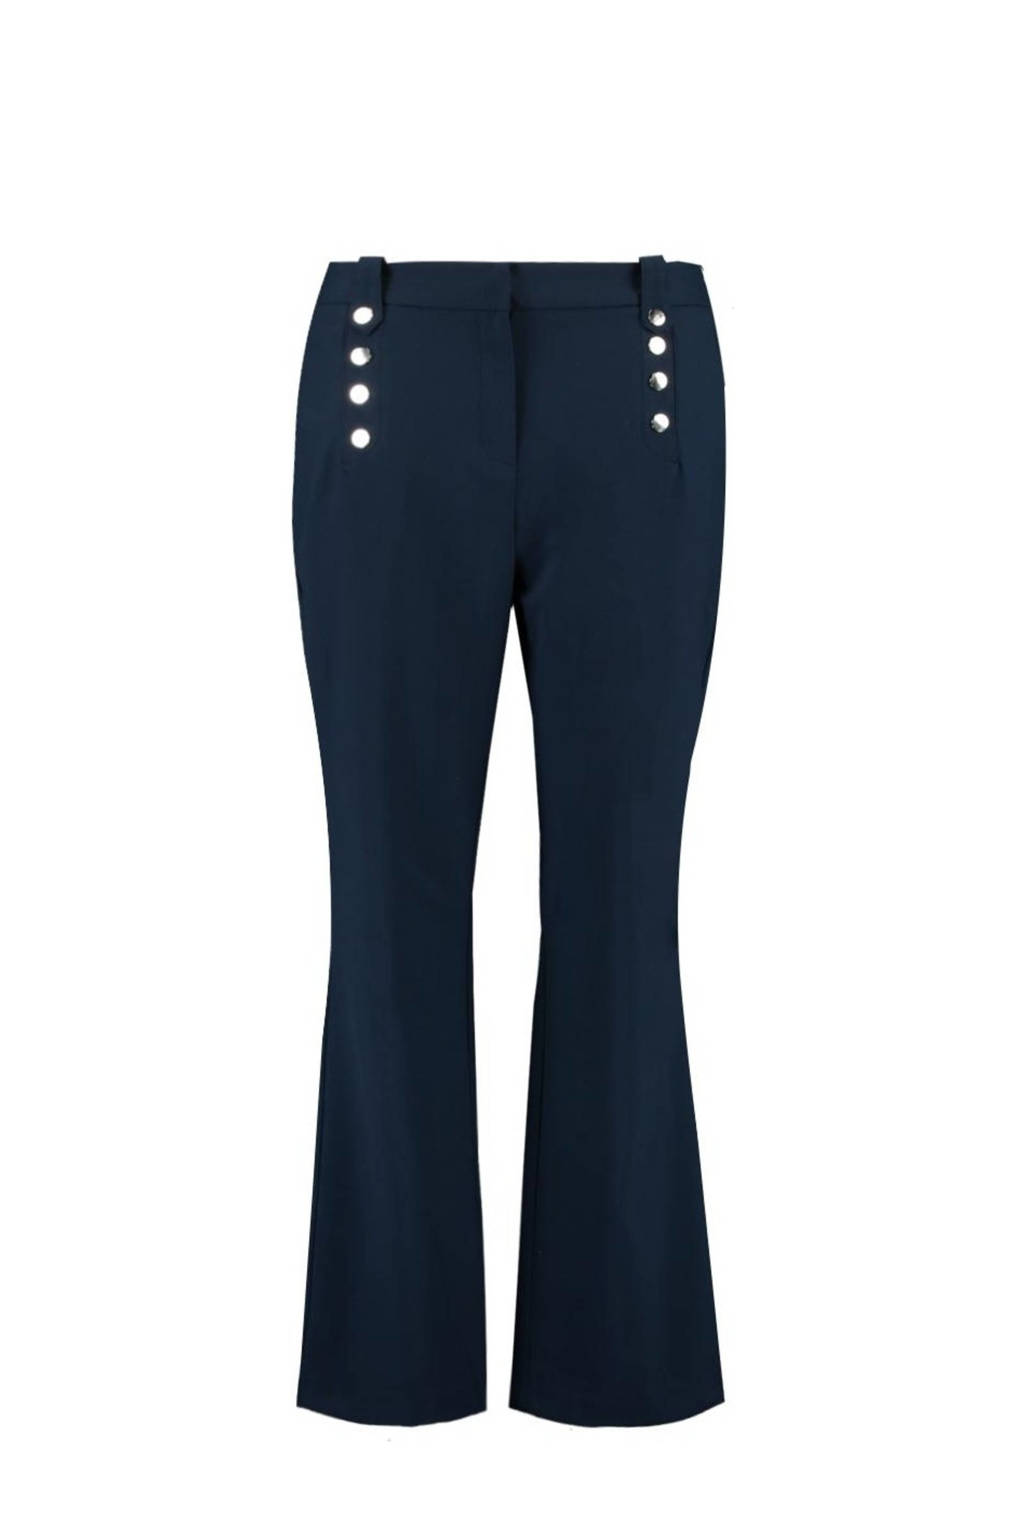 MS Mode straight fit broek blauw, Blauw